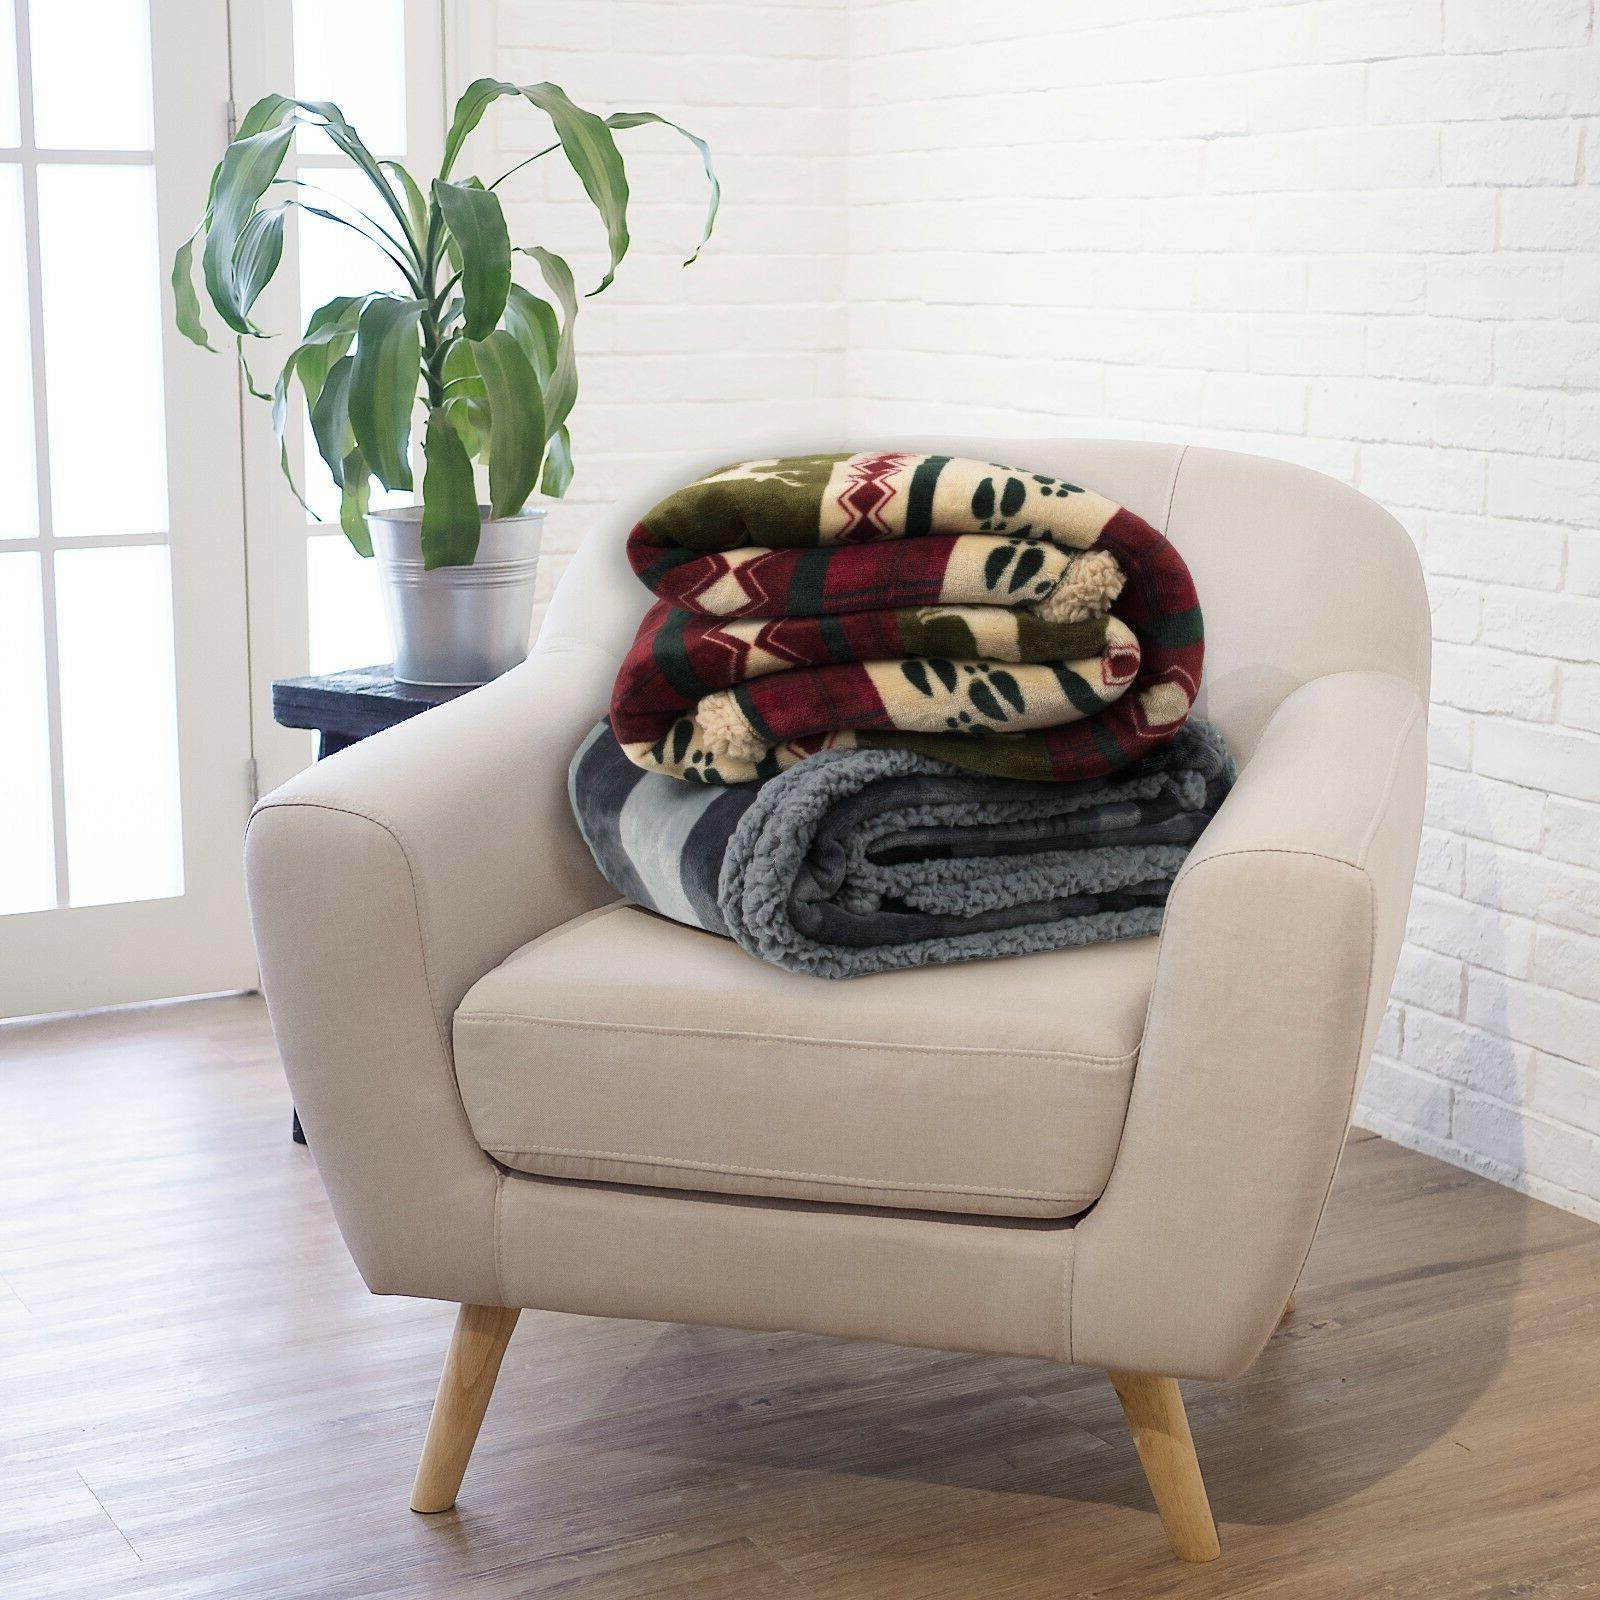 Soft Winter Blanket Flannel Striped Checkered Throw